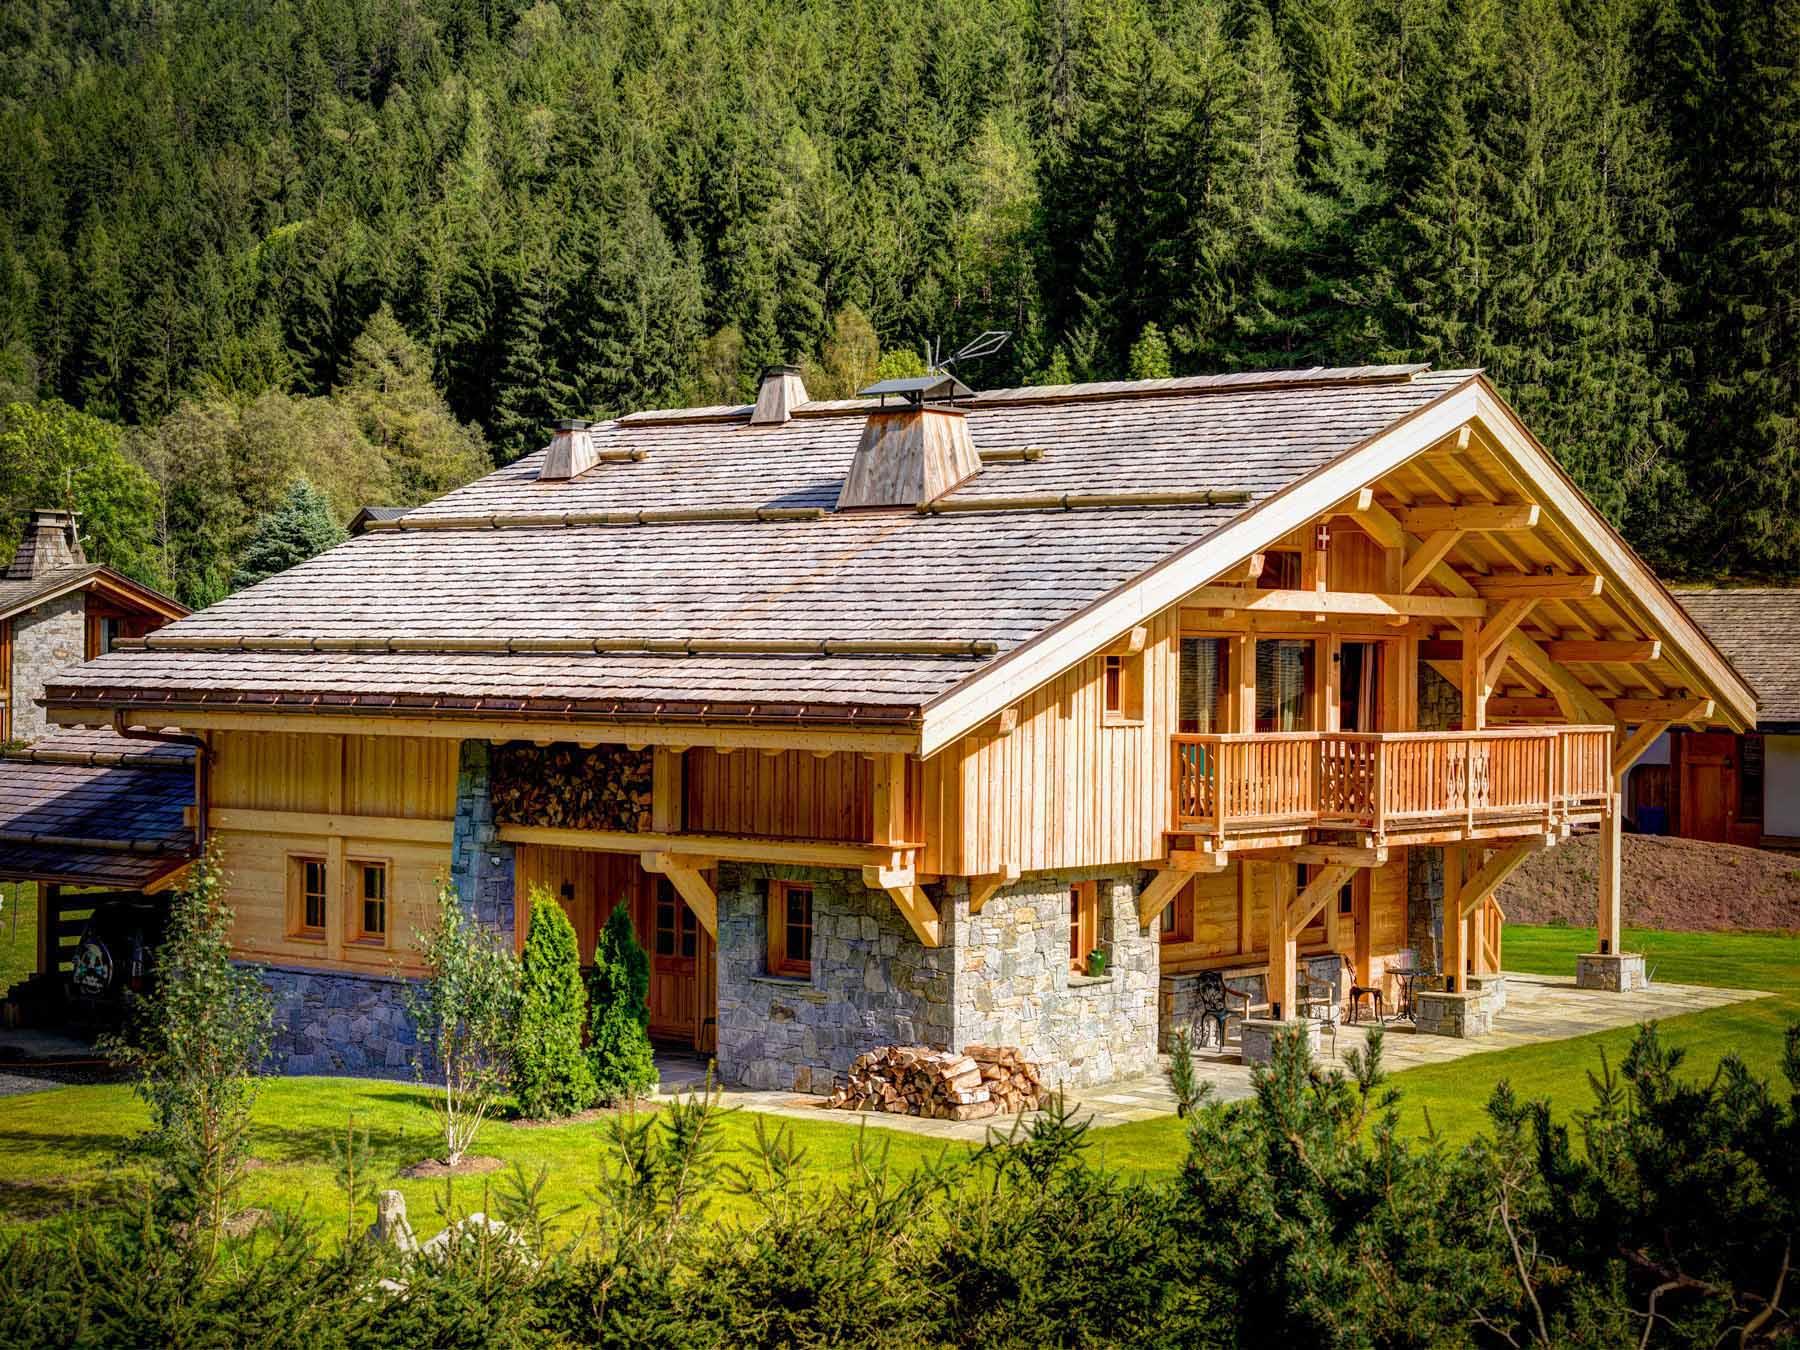 Chamonix Wooden Chalet